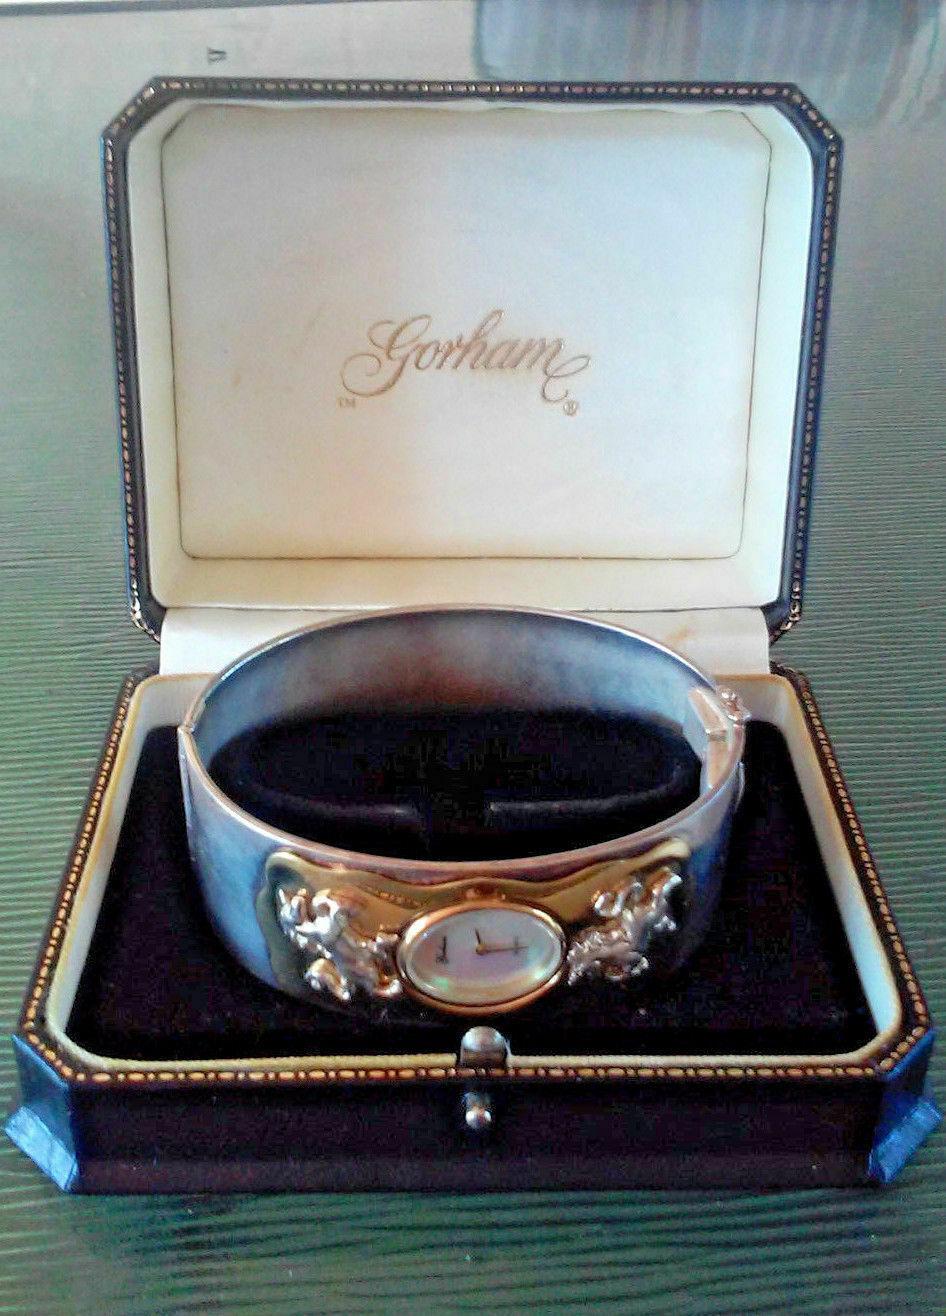 Vintage Gorham Unicorn Two Tone Hinged Bangle Bracelet Wrist Watch in Box RARE F